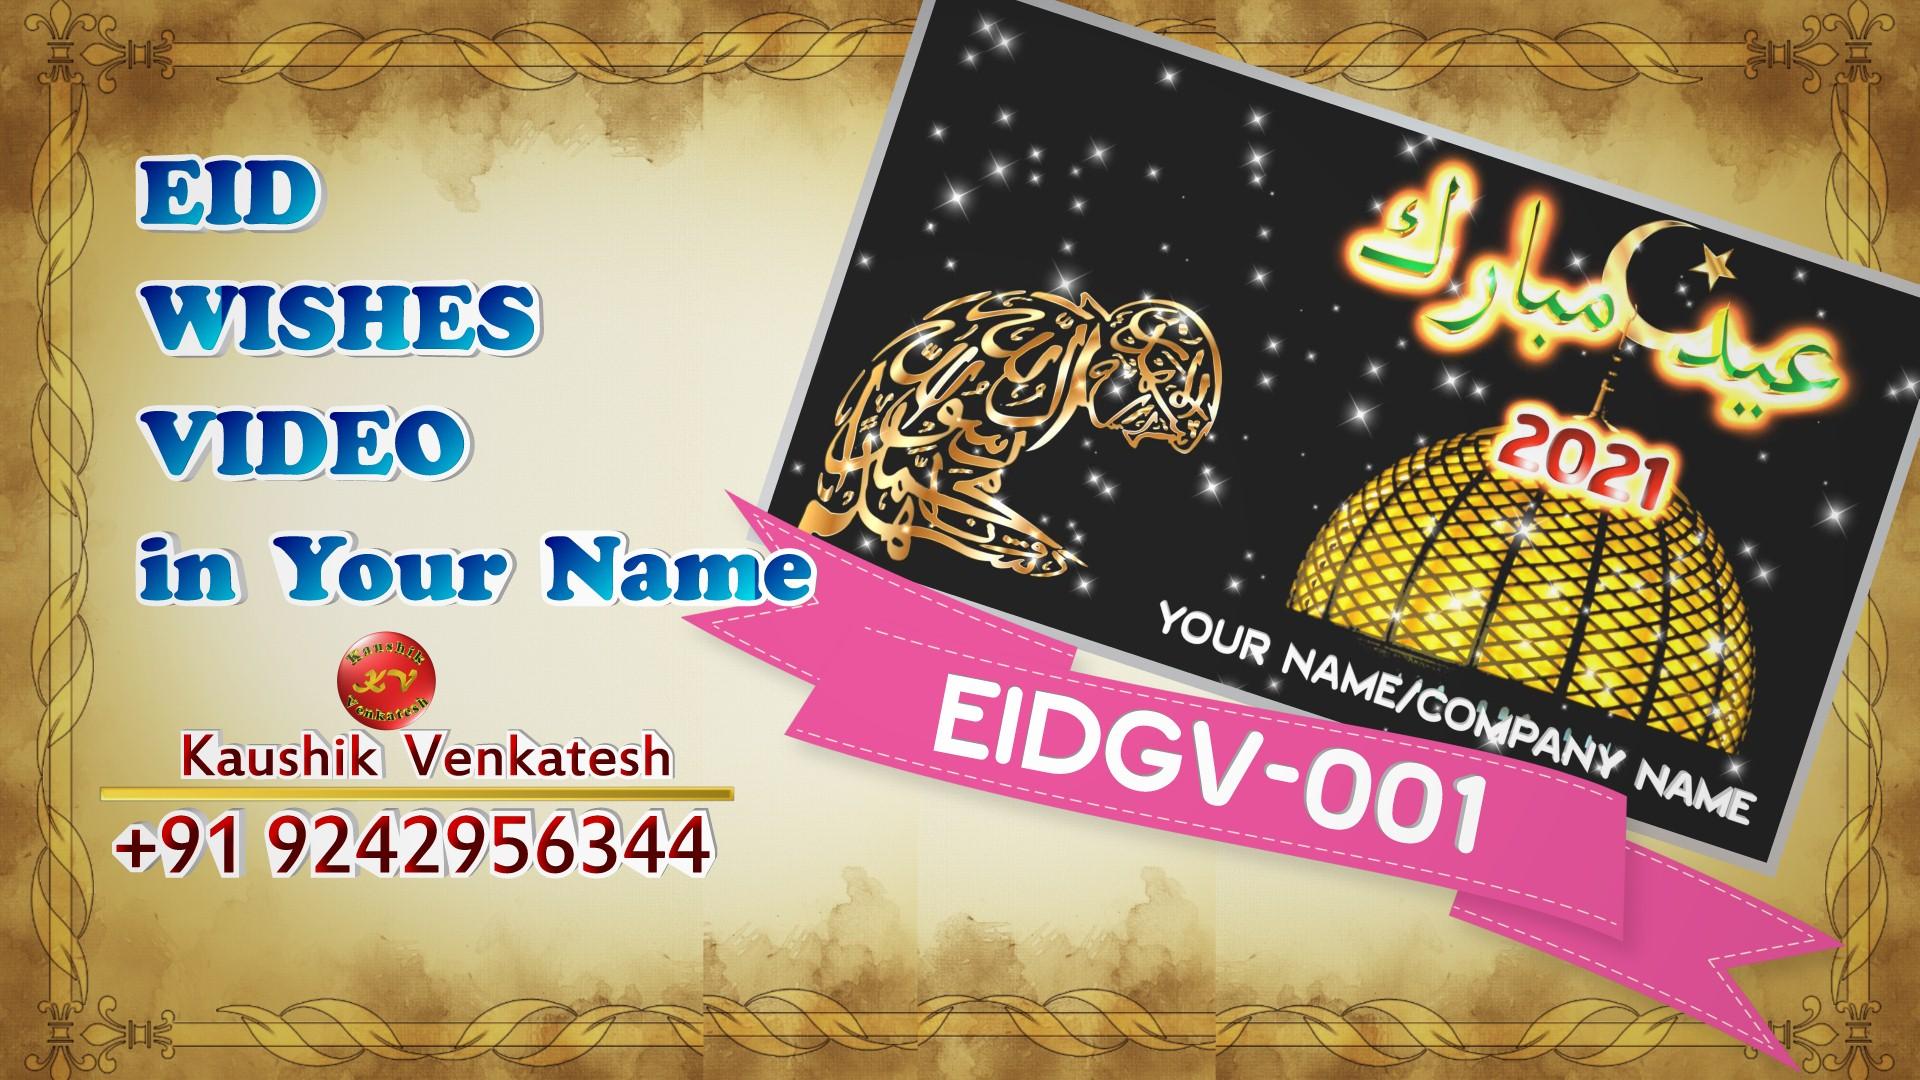 Personalized Wishes Video for Islamic festival Eid Mubarak 2021